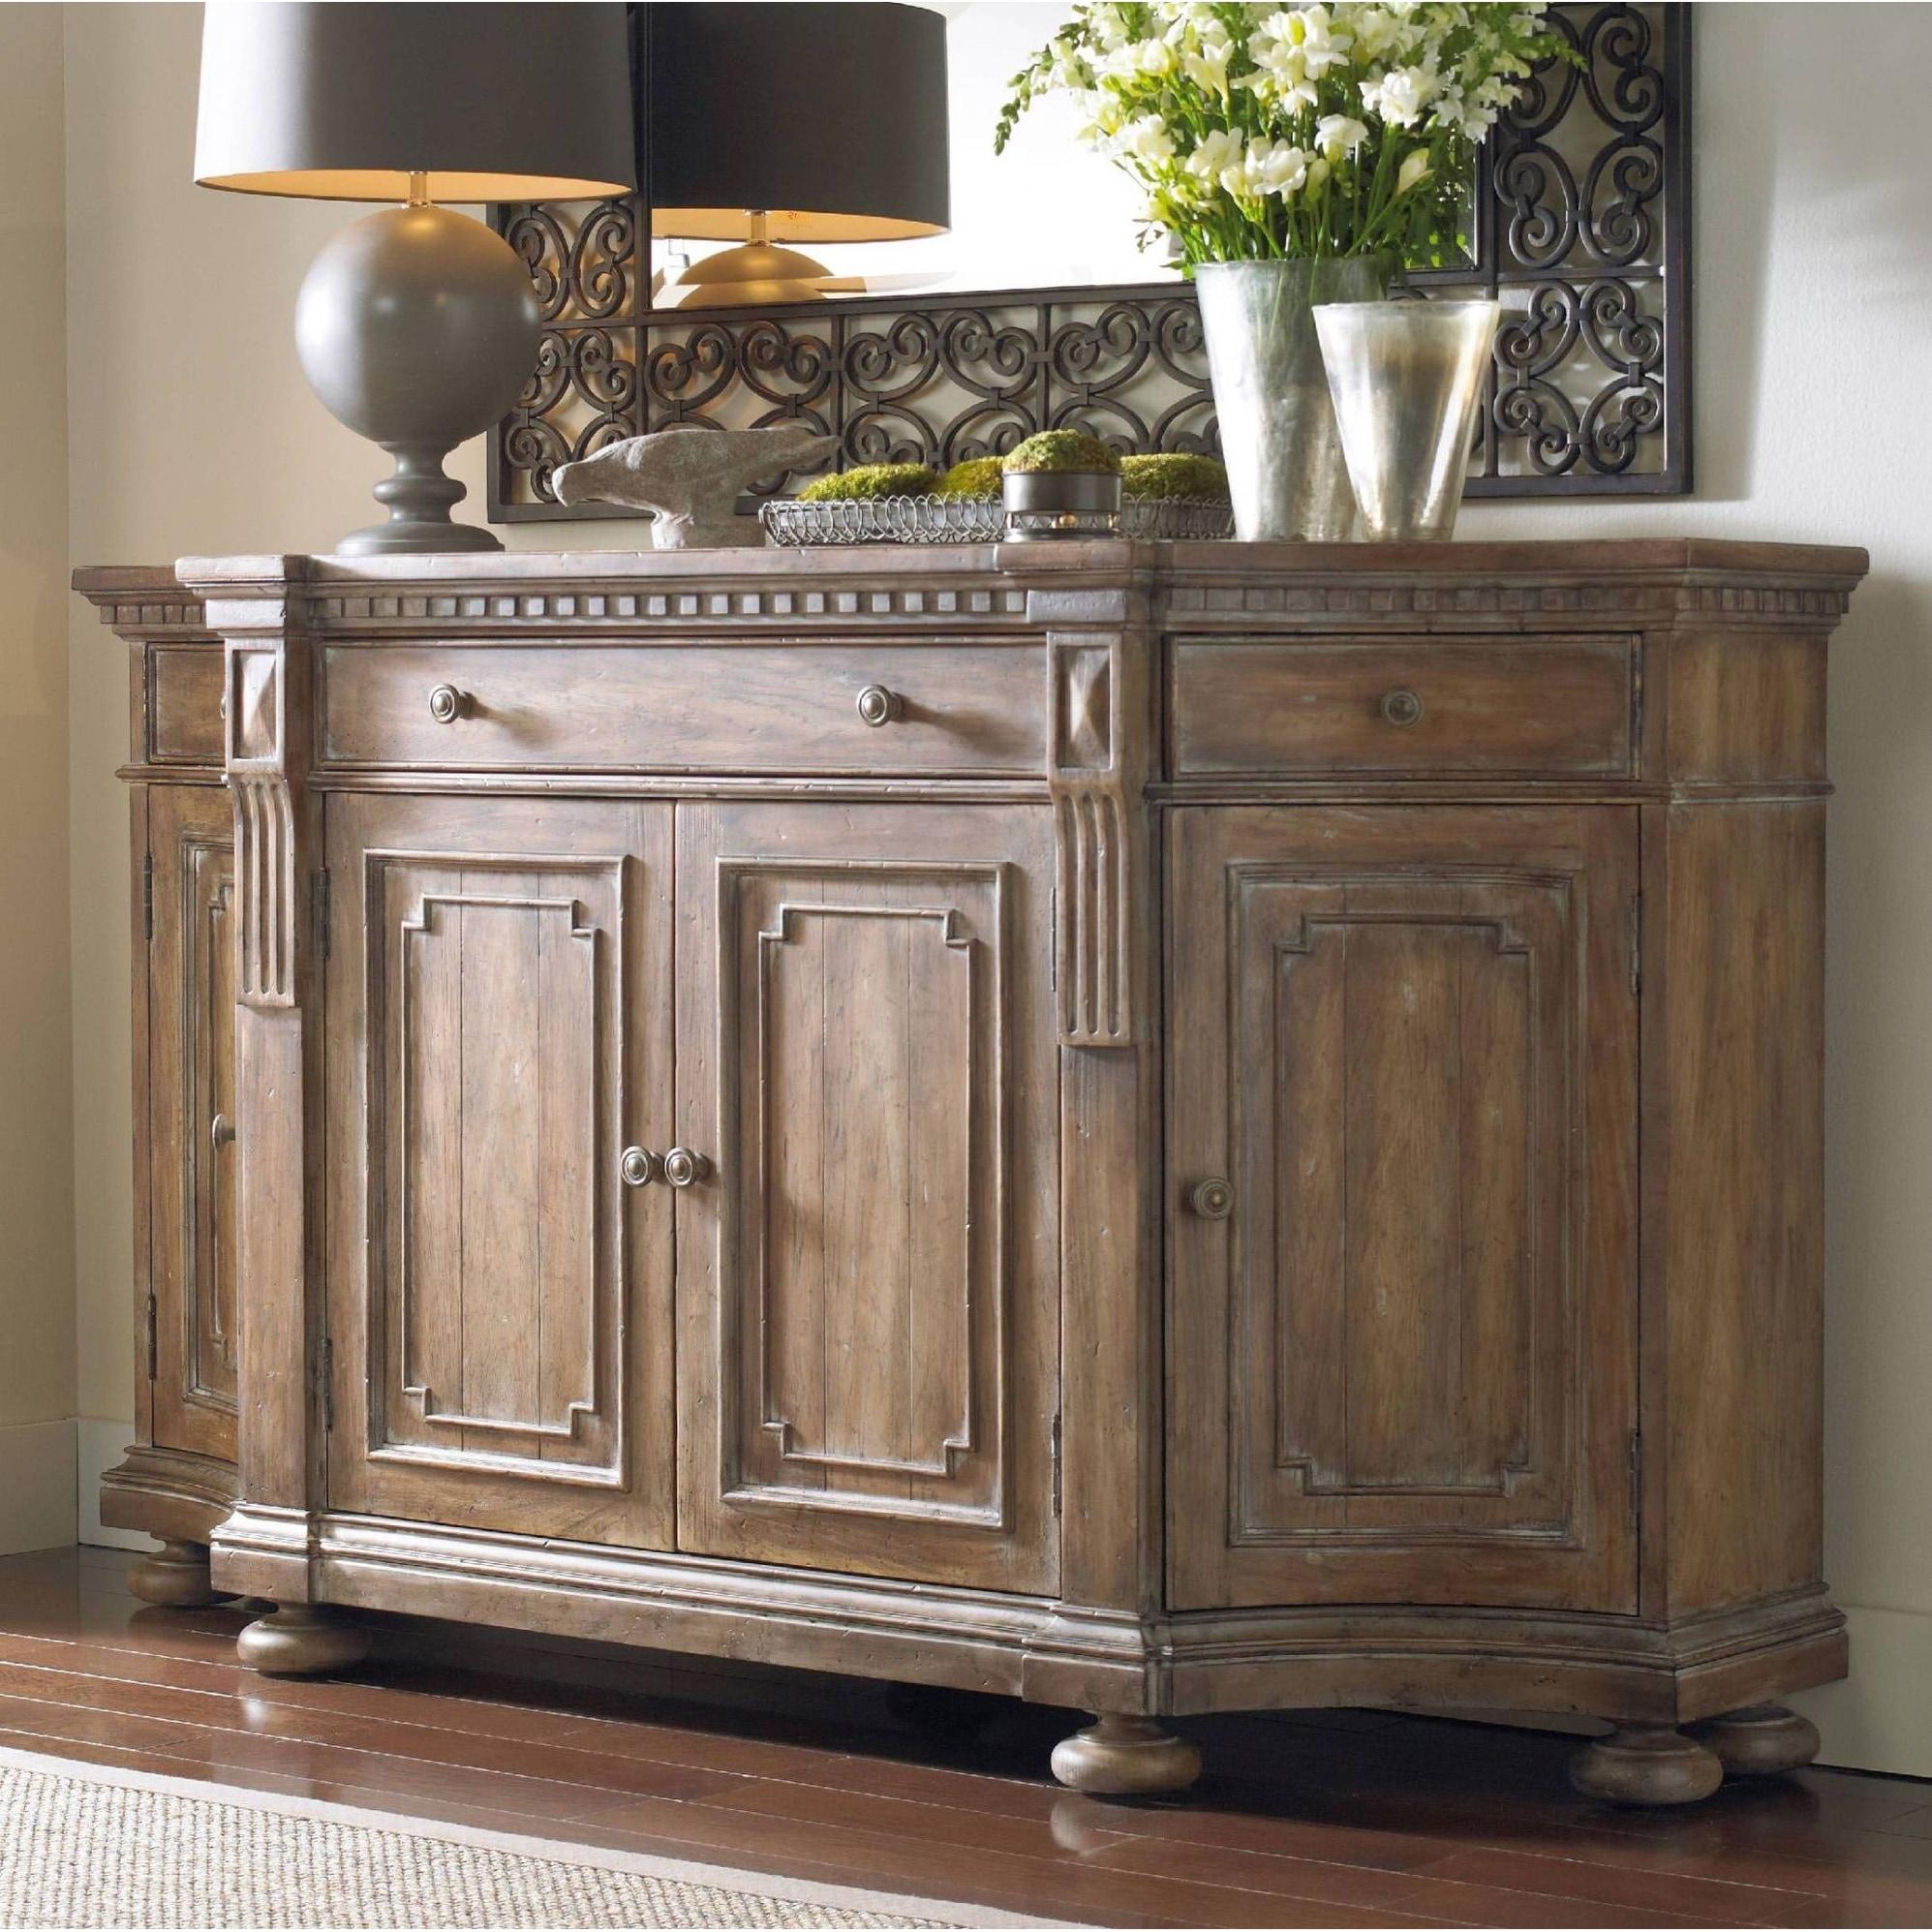 Shop Hooker Furniture 5107 85001 72 Wide Hardwood Cabinet From The